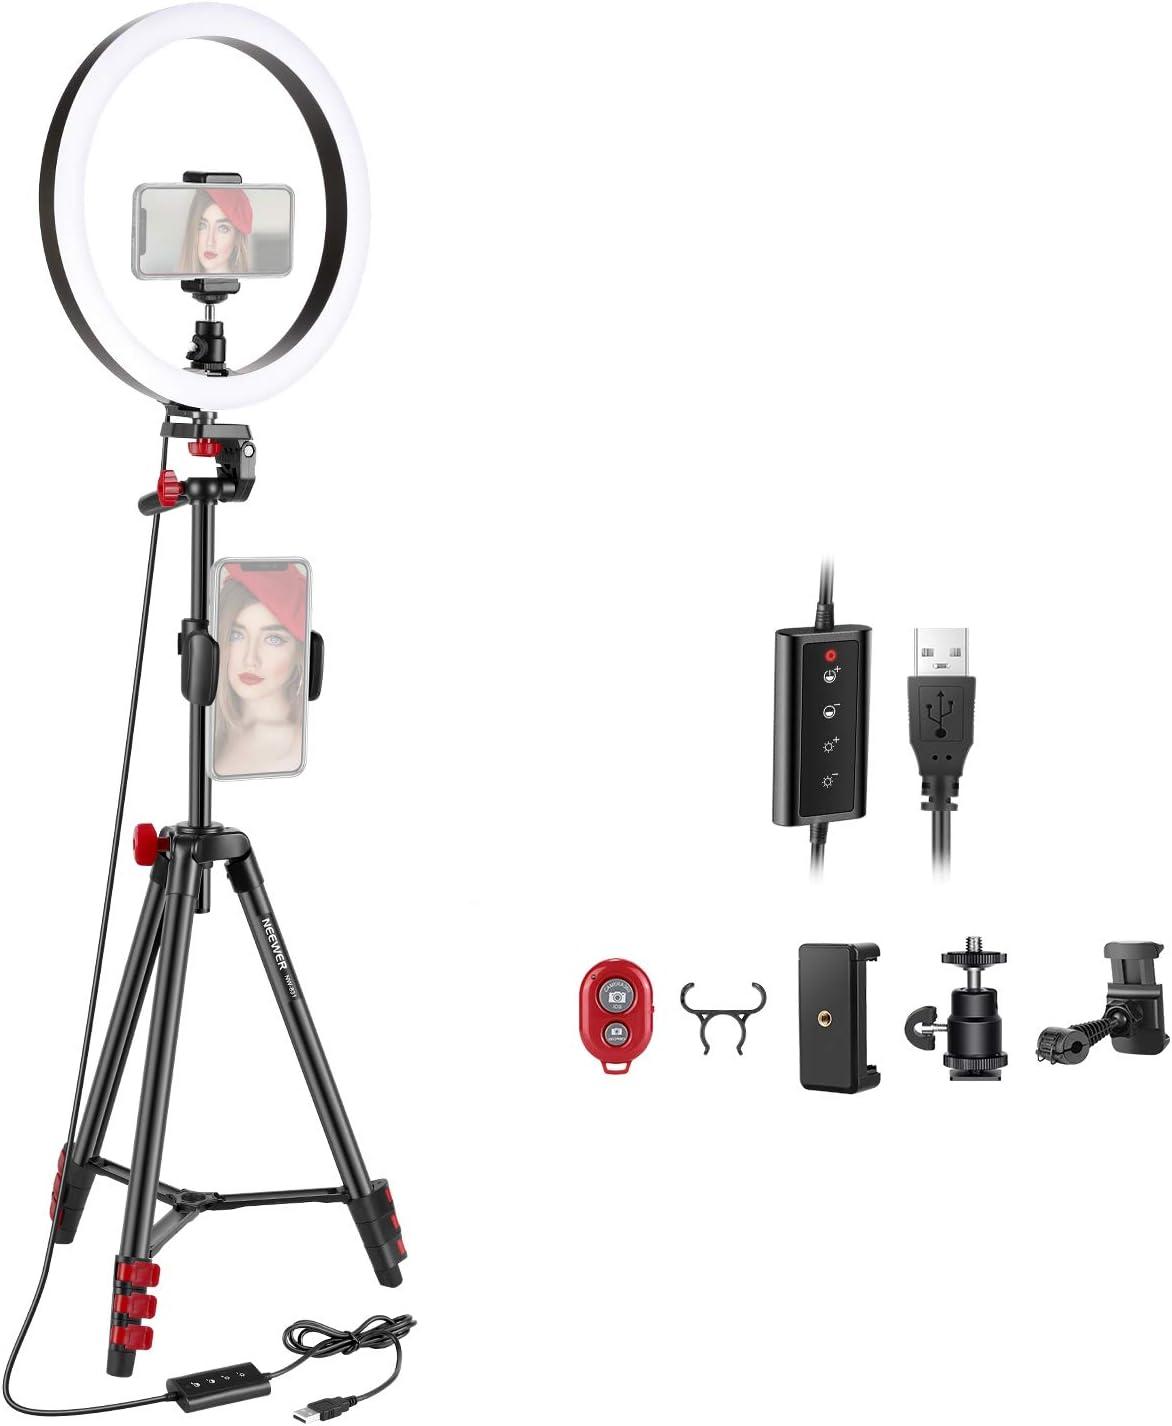 Neewer Led Ringlicht Mit Stativ 25 4 Cm Dimmbar Kamera